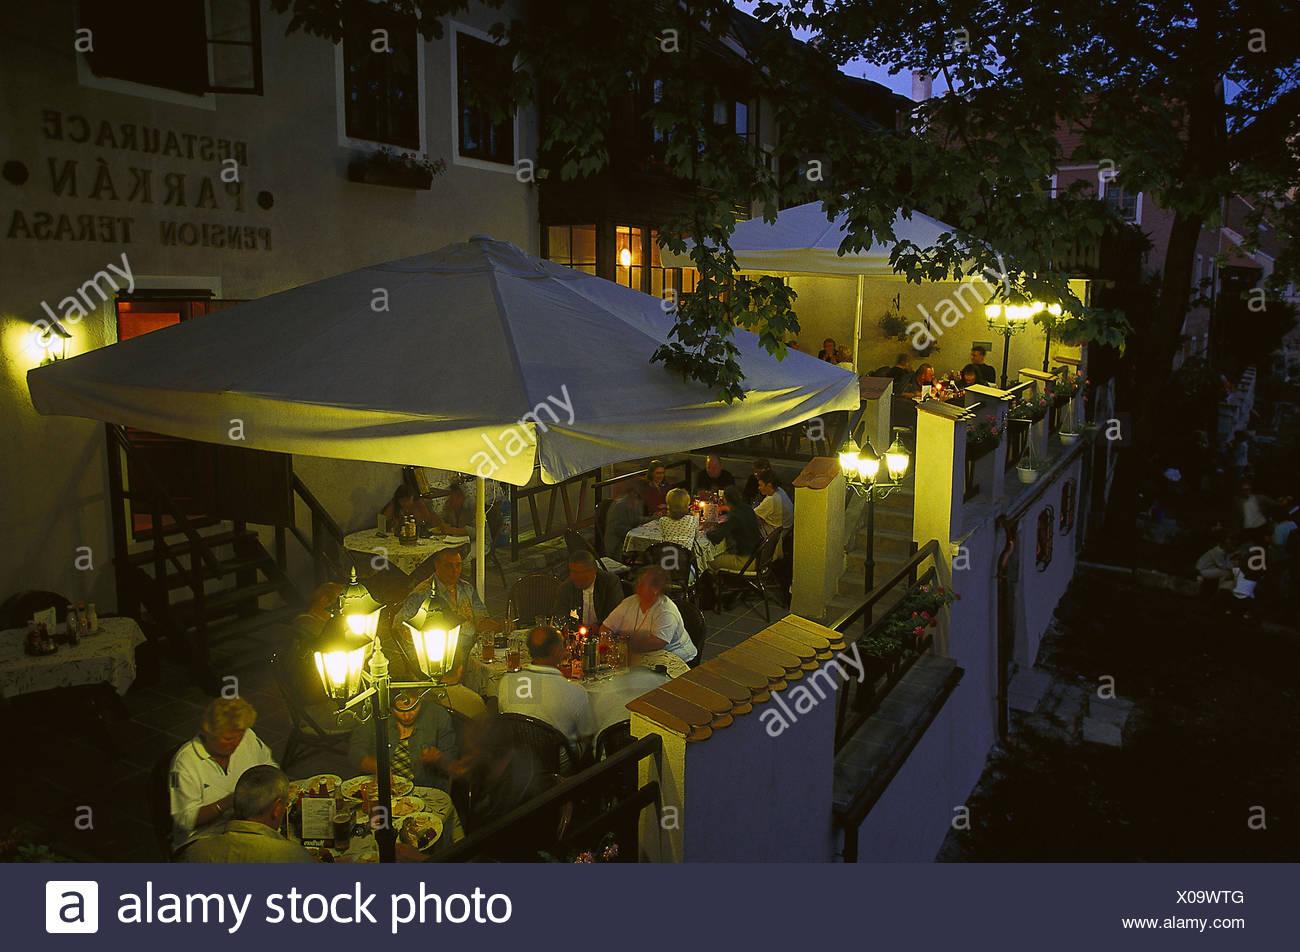 Wundervoll Tschechische Republik, Südböhmen, Cesky Krumlov, Moldauufer, Cafe, Terrasse,  Gäste, Abend, No Model Release! Europa, Osteuropa, Tschechien, Ceská  Republika, ...